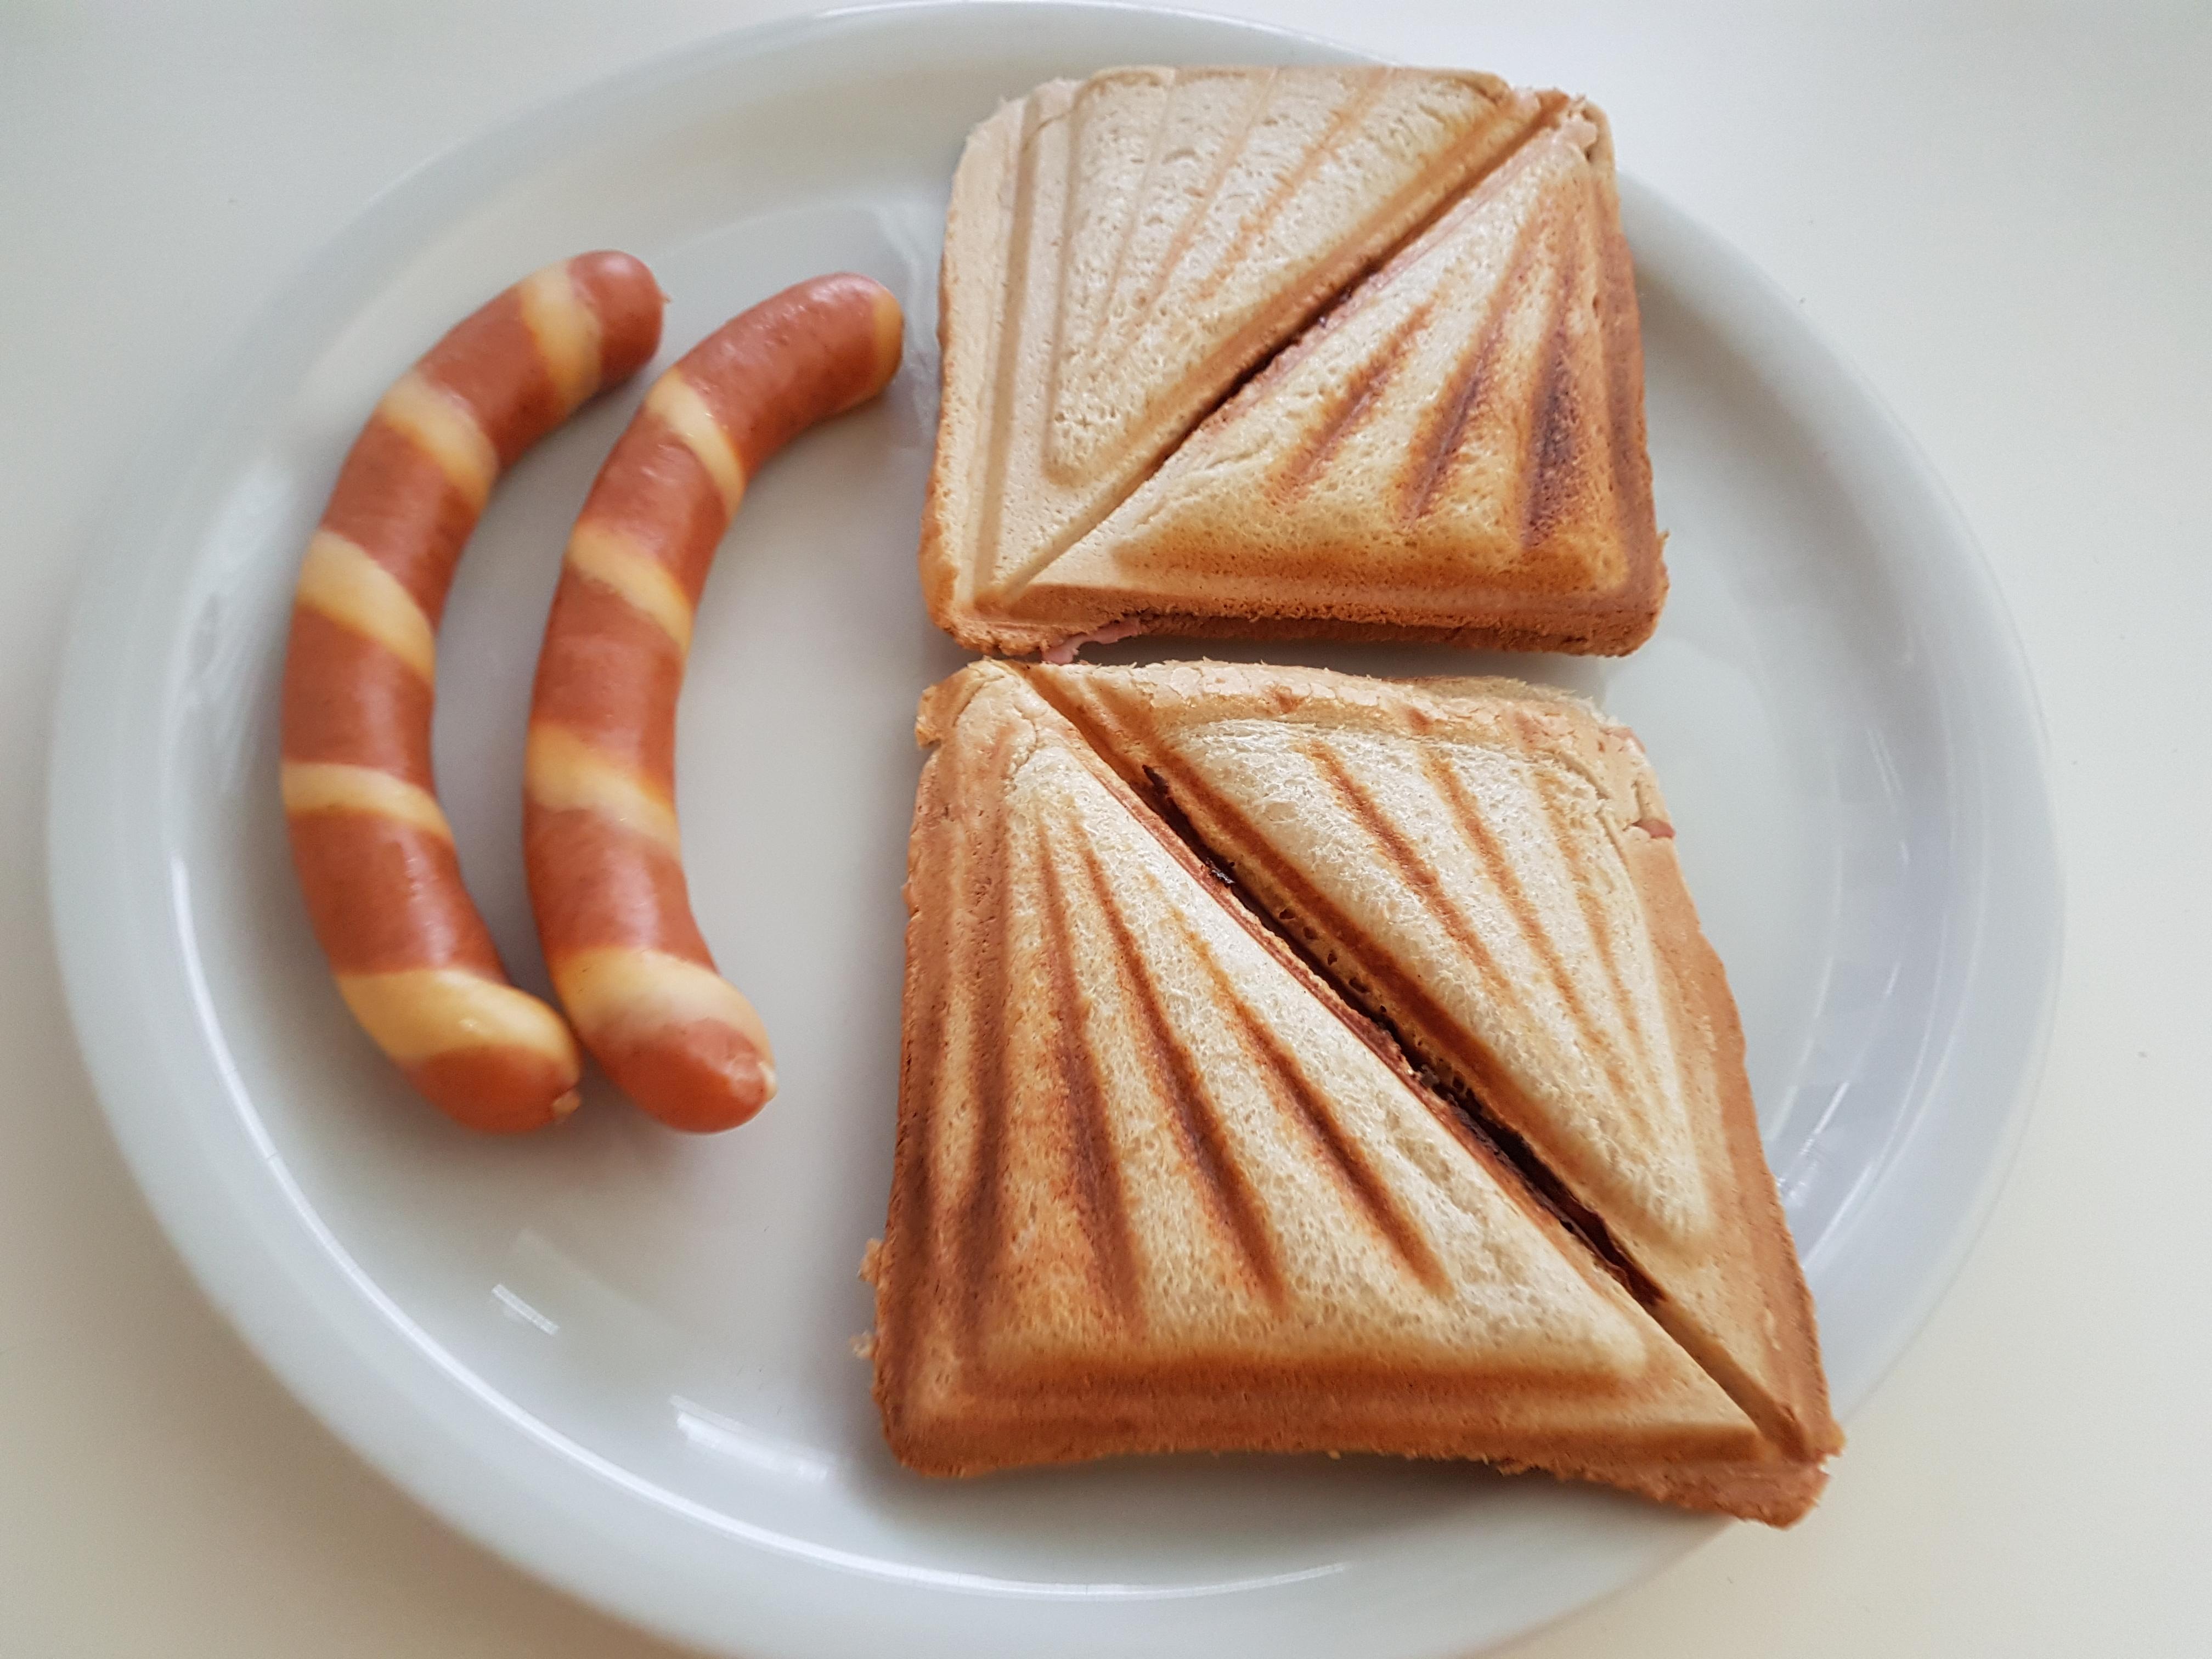 http://foodloader.net/Holz_2018-05-13_Gstreifte_und_Sandwiches.jpg